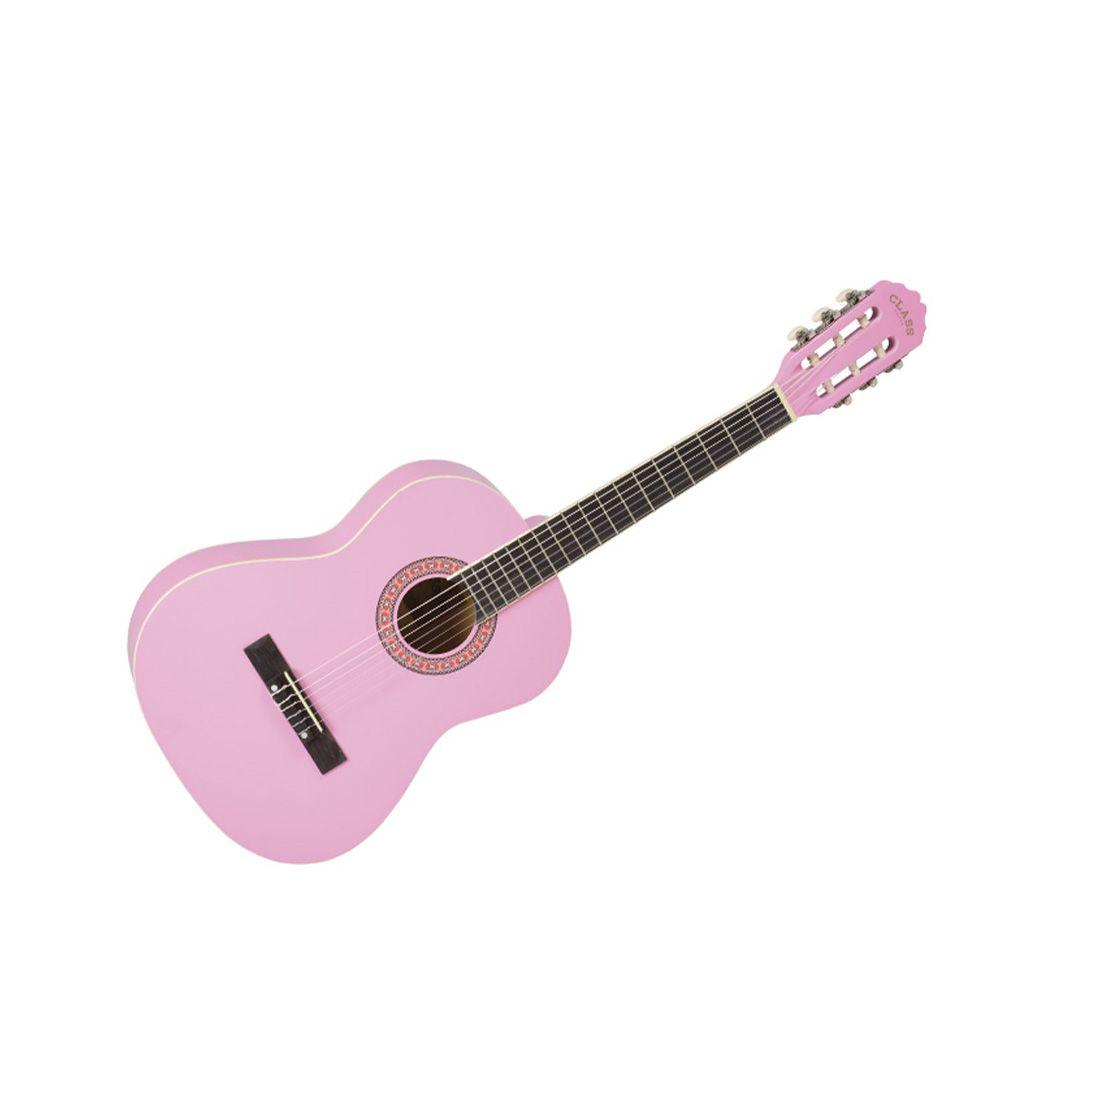 Violão Nylon Infantil 3/4 Class CL36 Pink